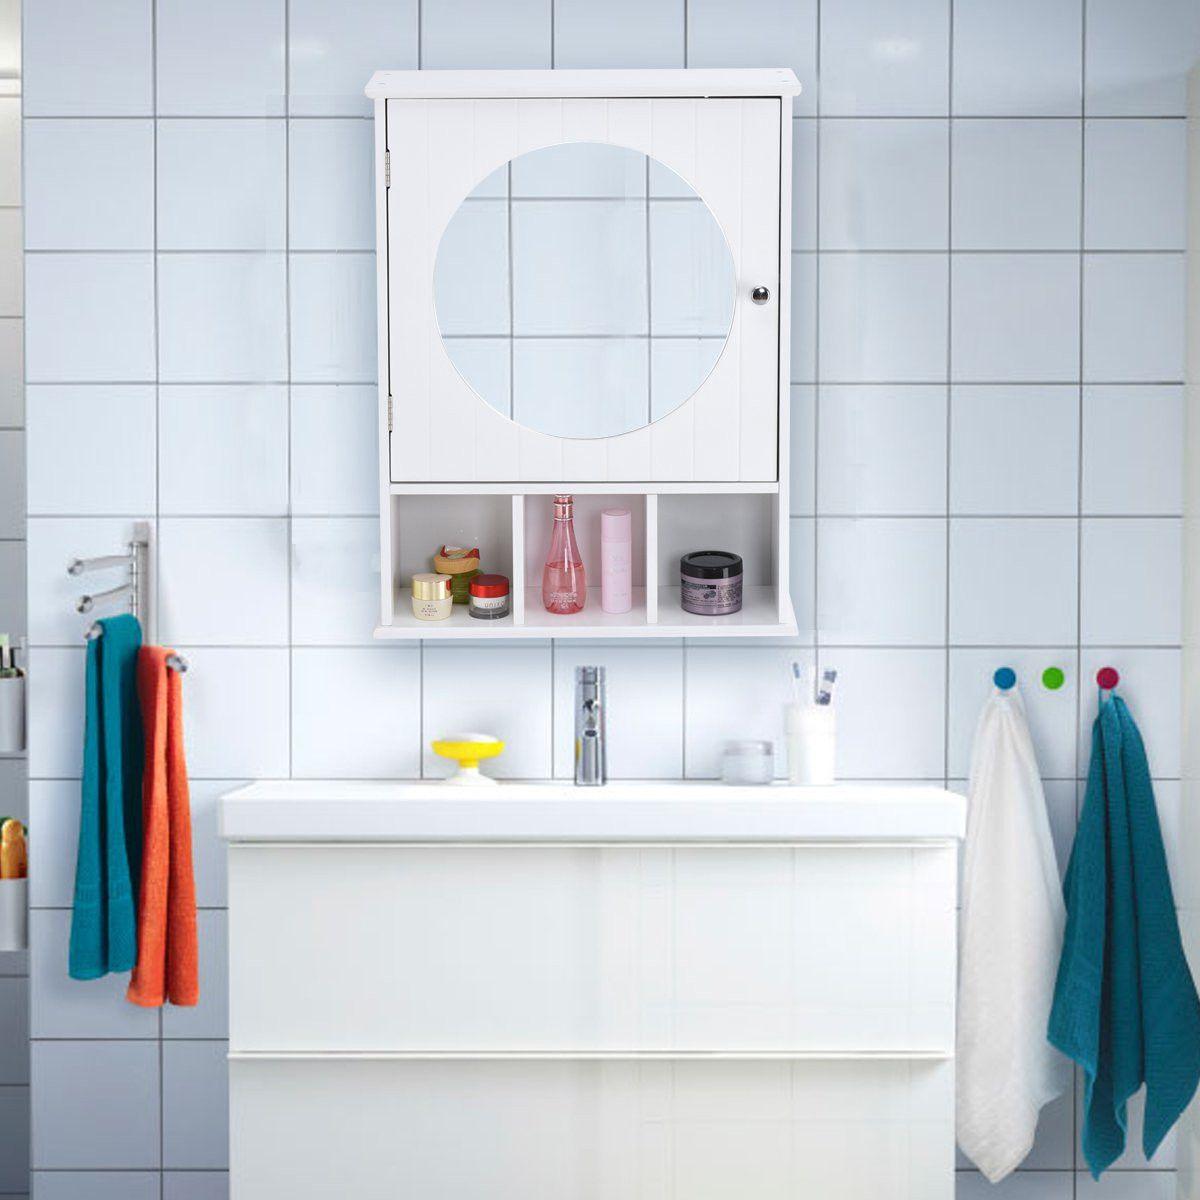 Giantex Adjustable Wall Mounted Round Mirror W Storage Organizer Cabinet Bathroom Furniture Modern Wall Storage Wood Bathroom Cabinets [ 1200 x 1200 Pixel ]